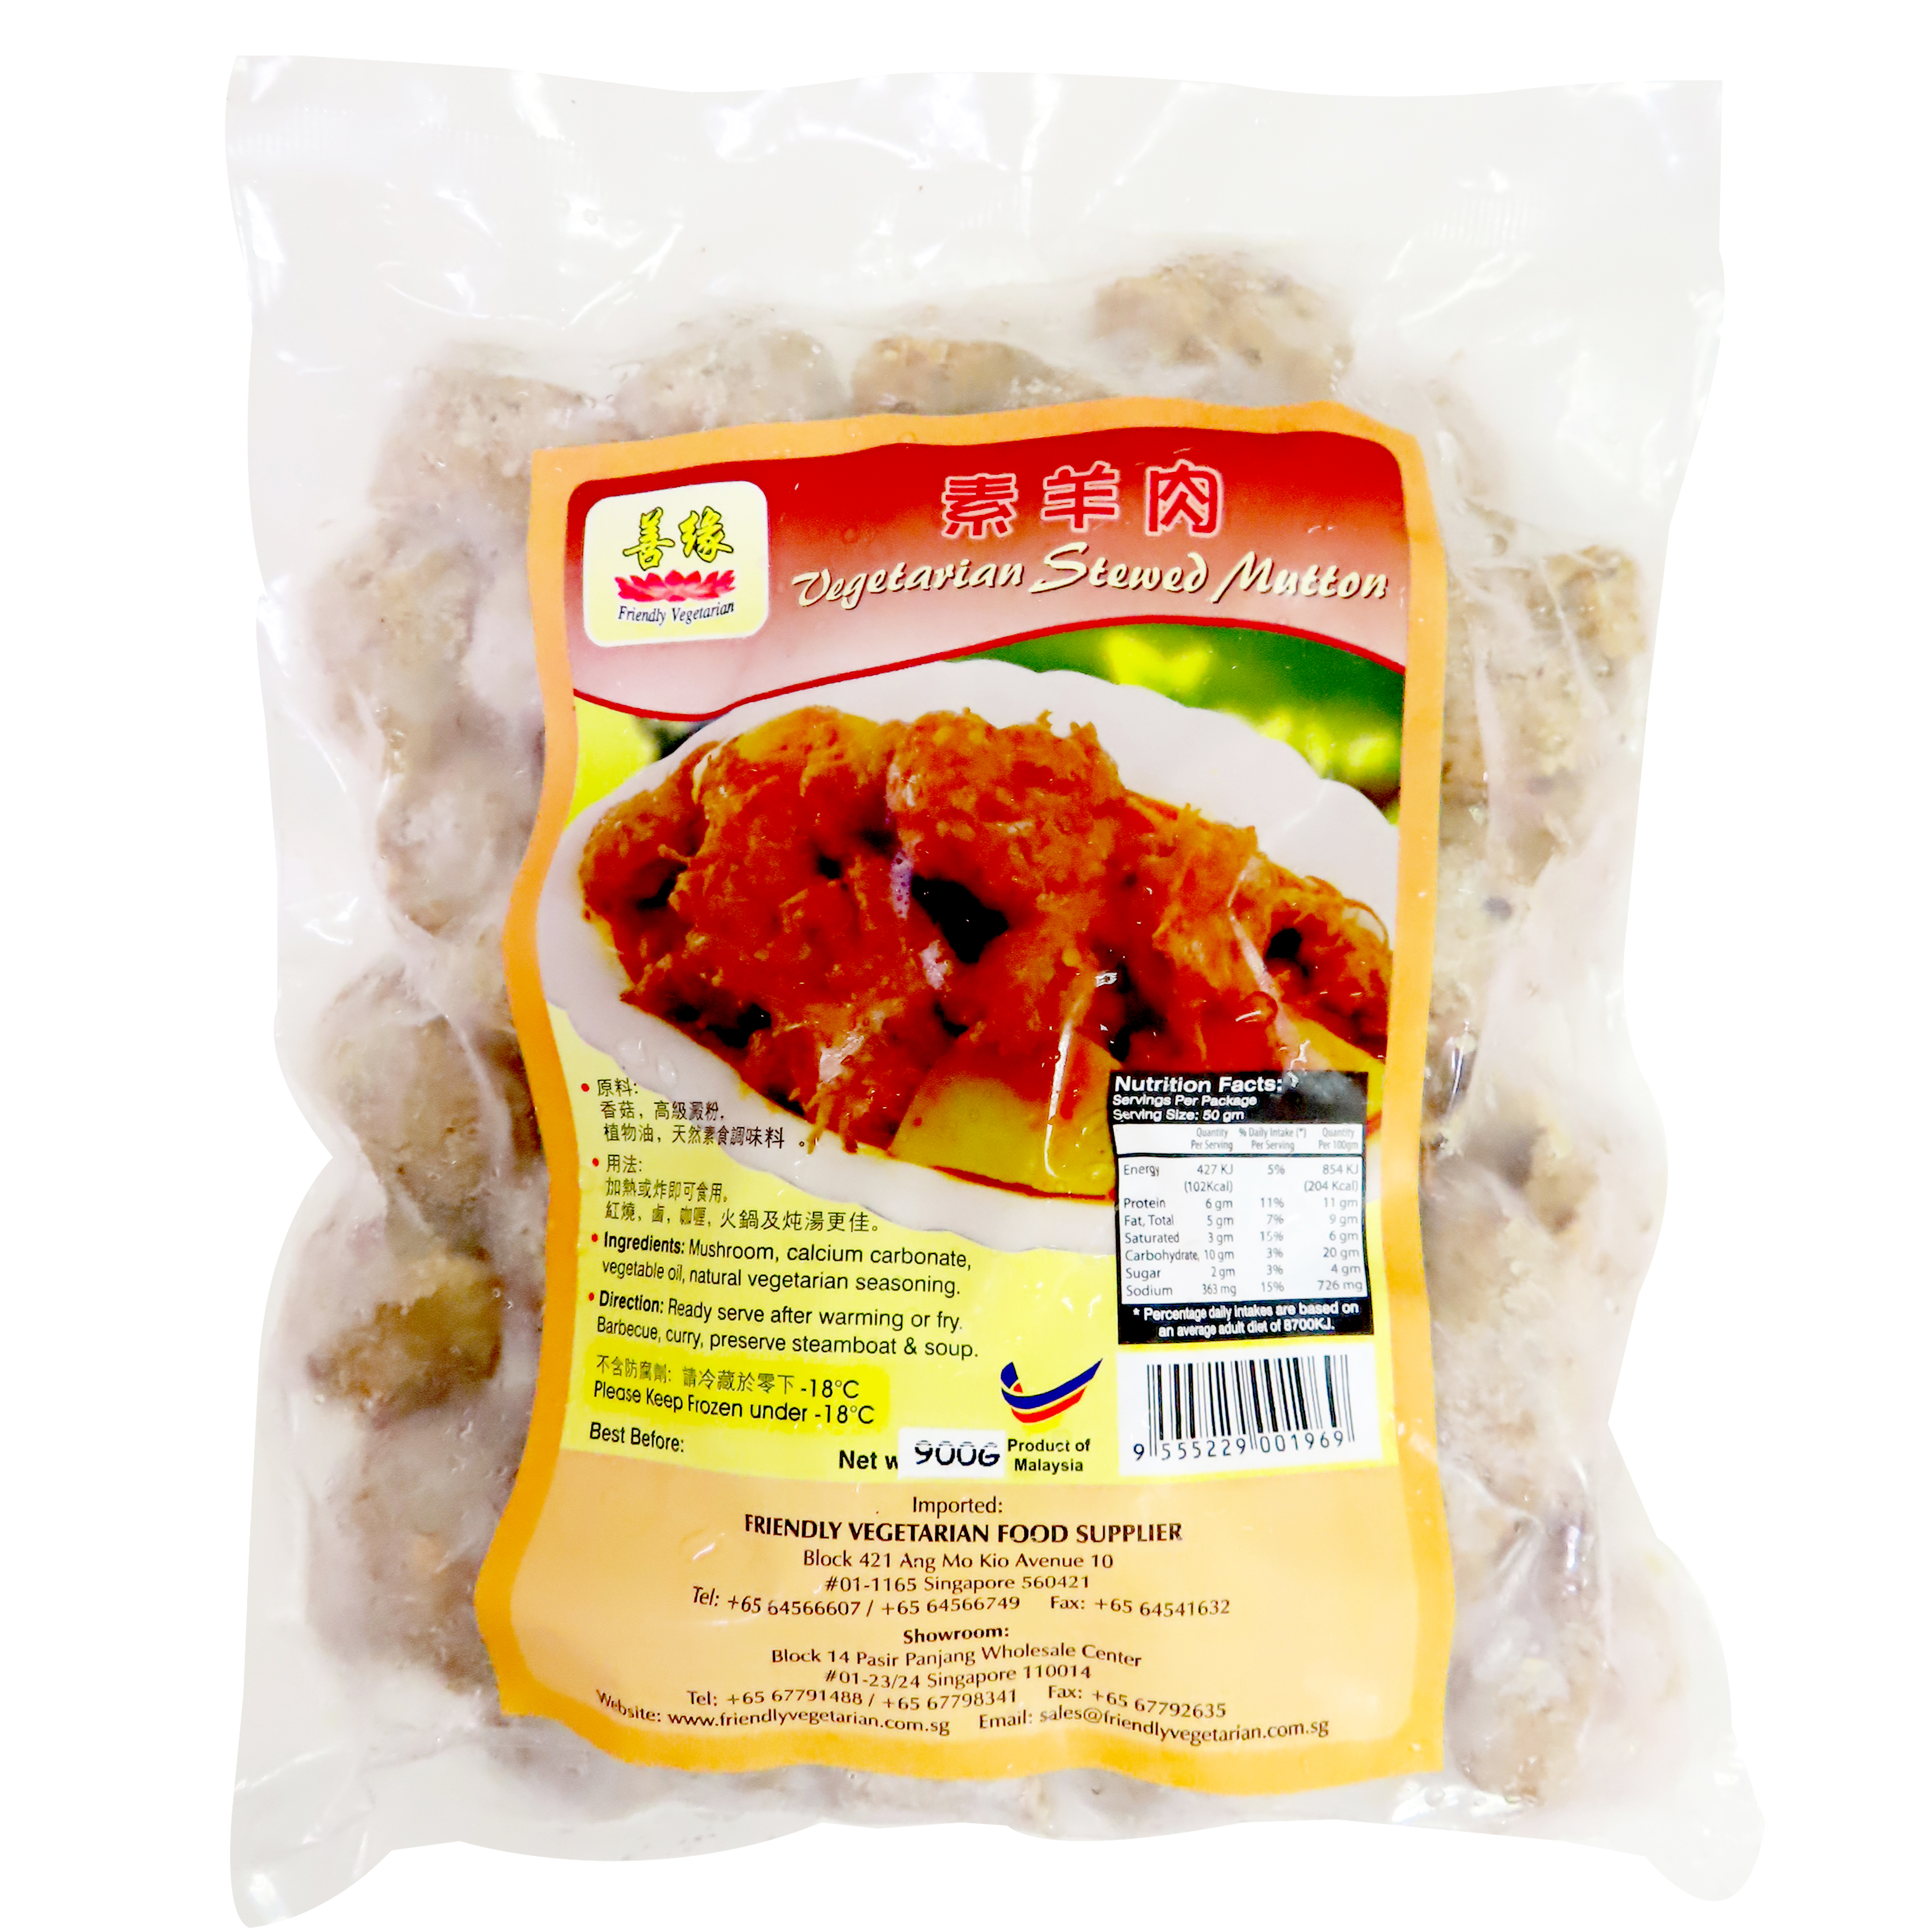 Image Vegan Stewed Mutton 善缘 - 素羊肉(纯素) 900 grams